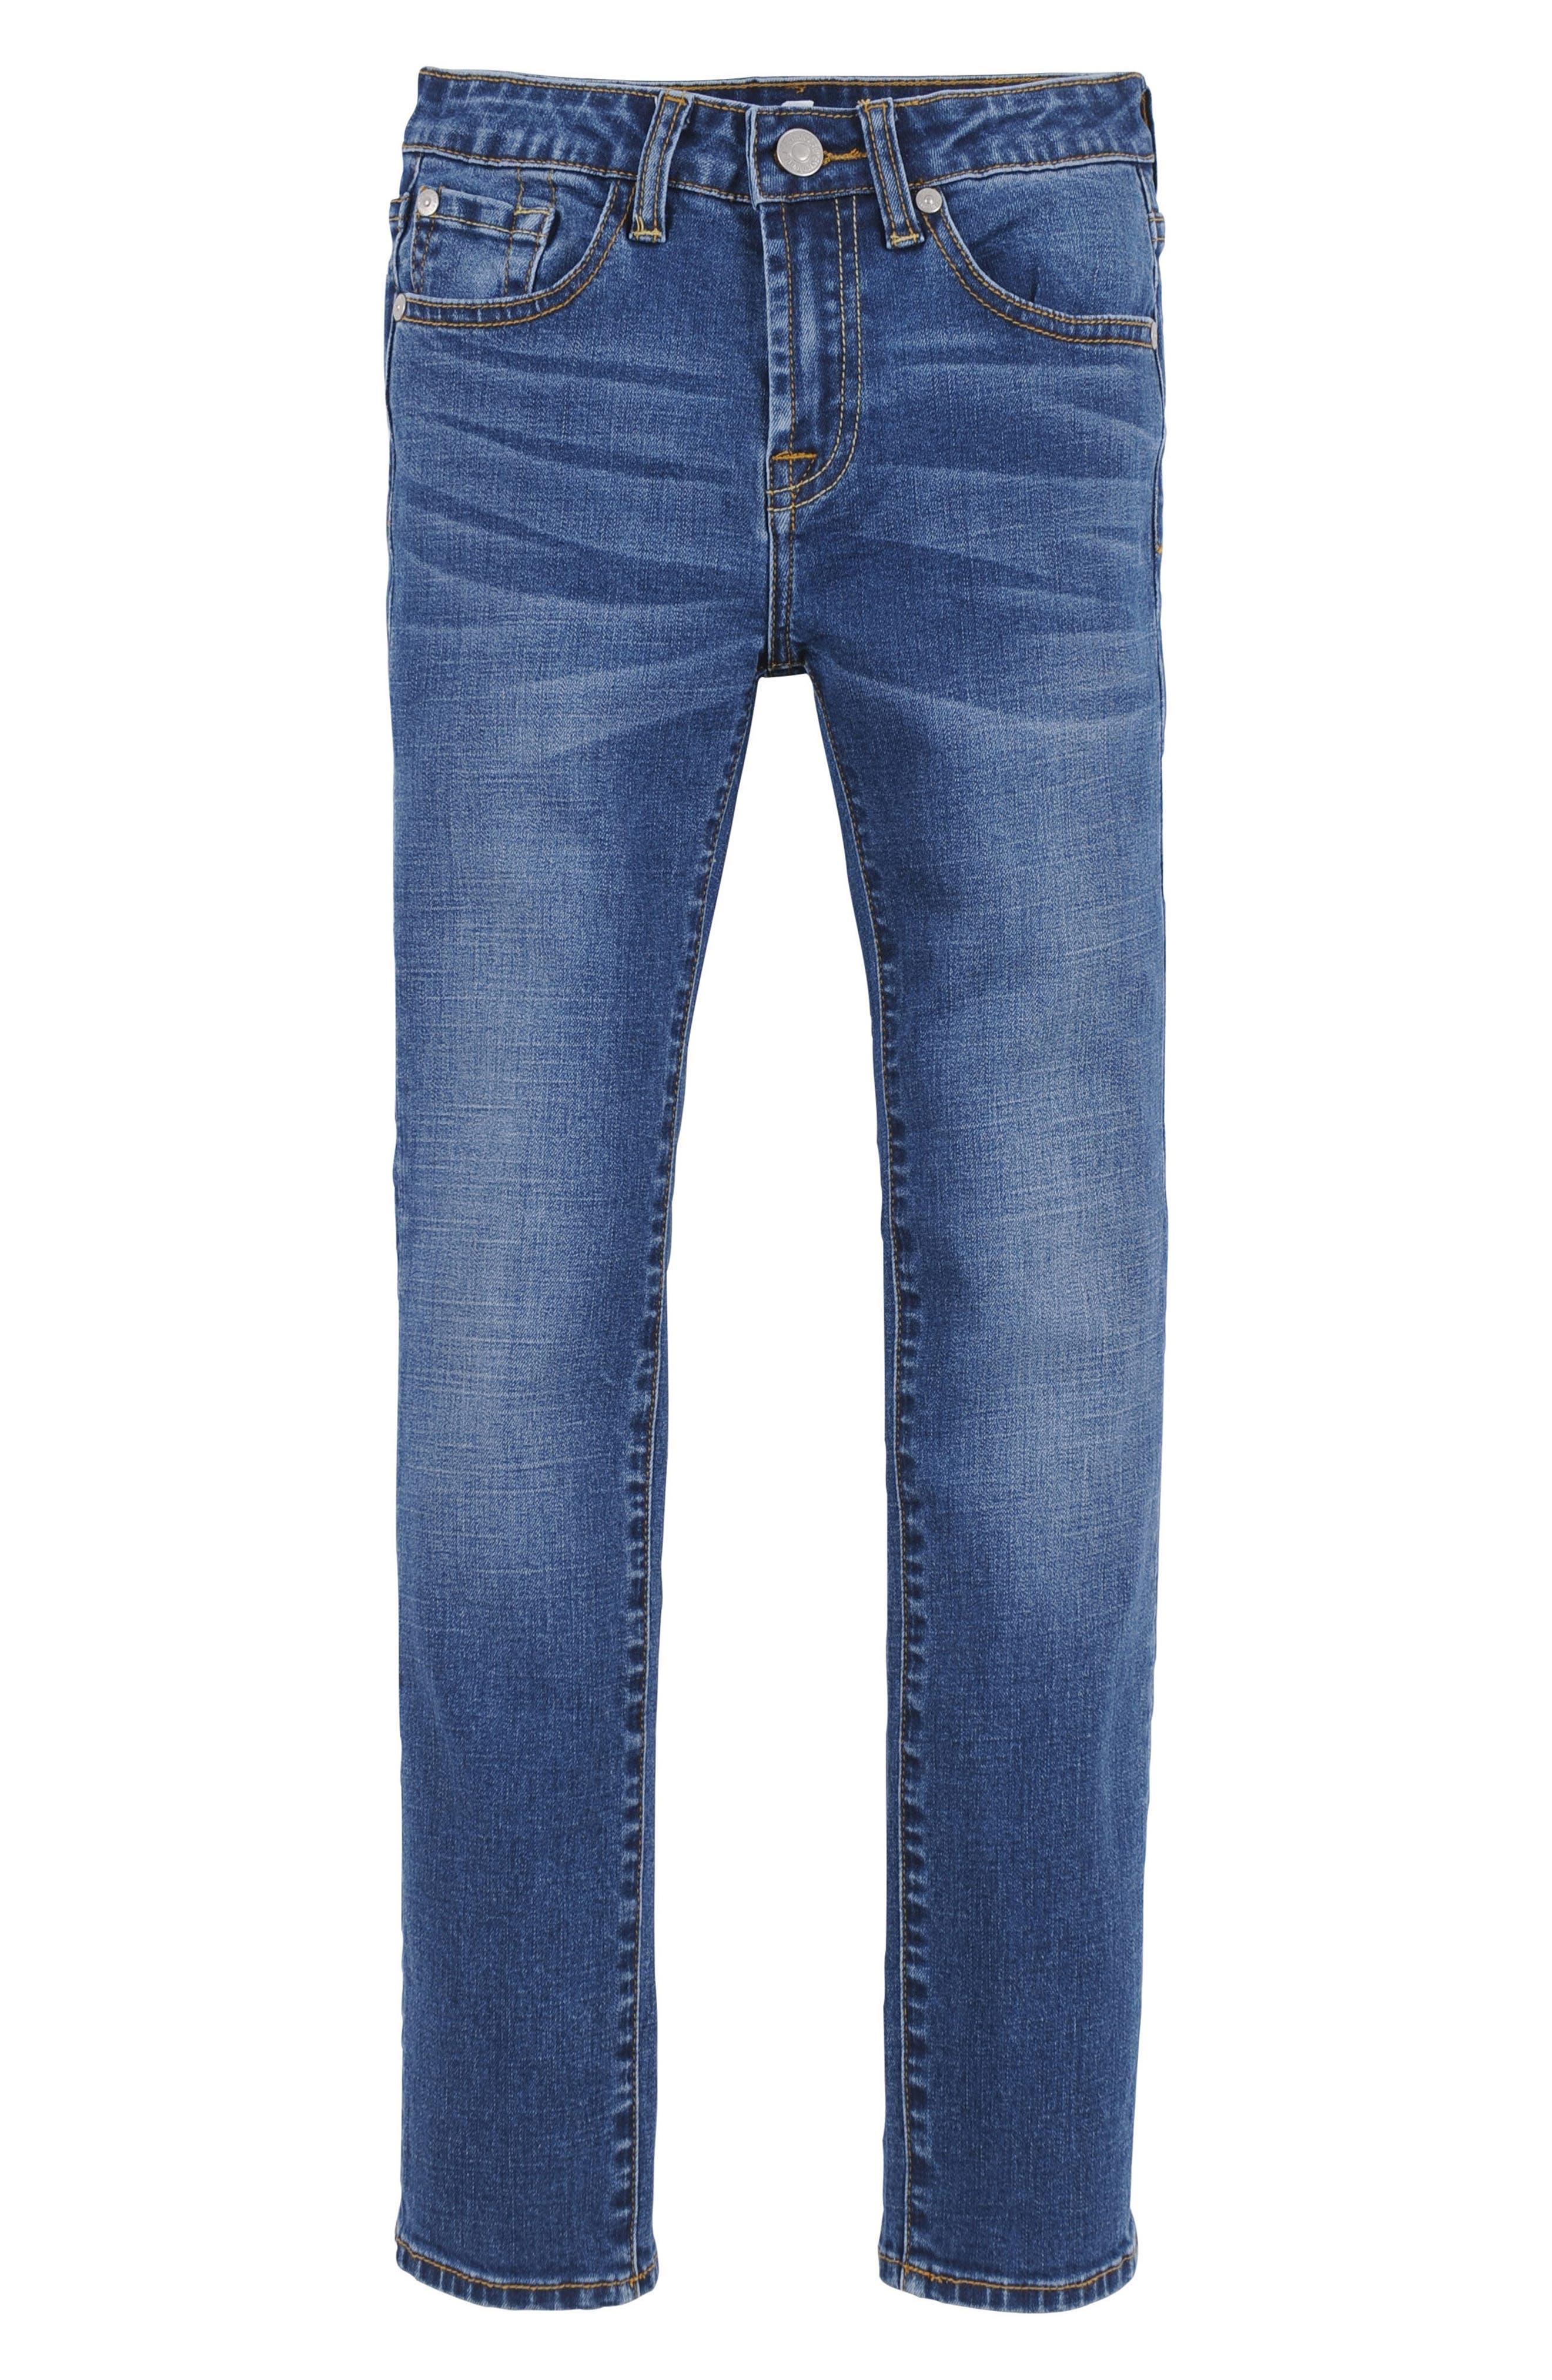 'Slimmy' Jeans,                         Main,                         color, Bristol